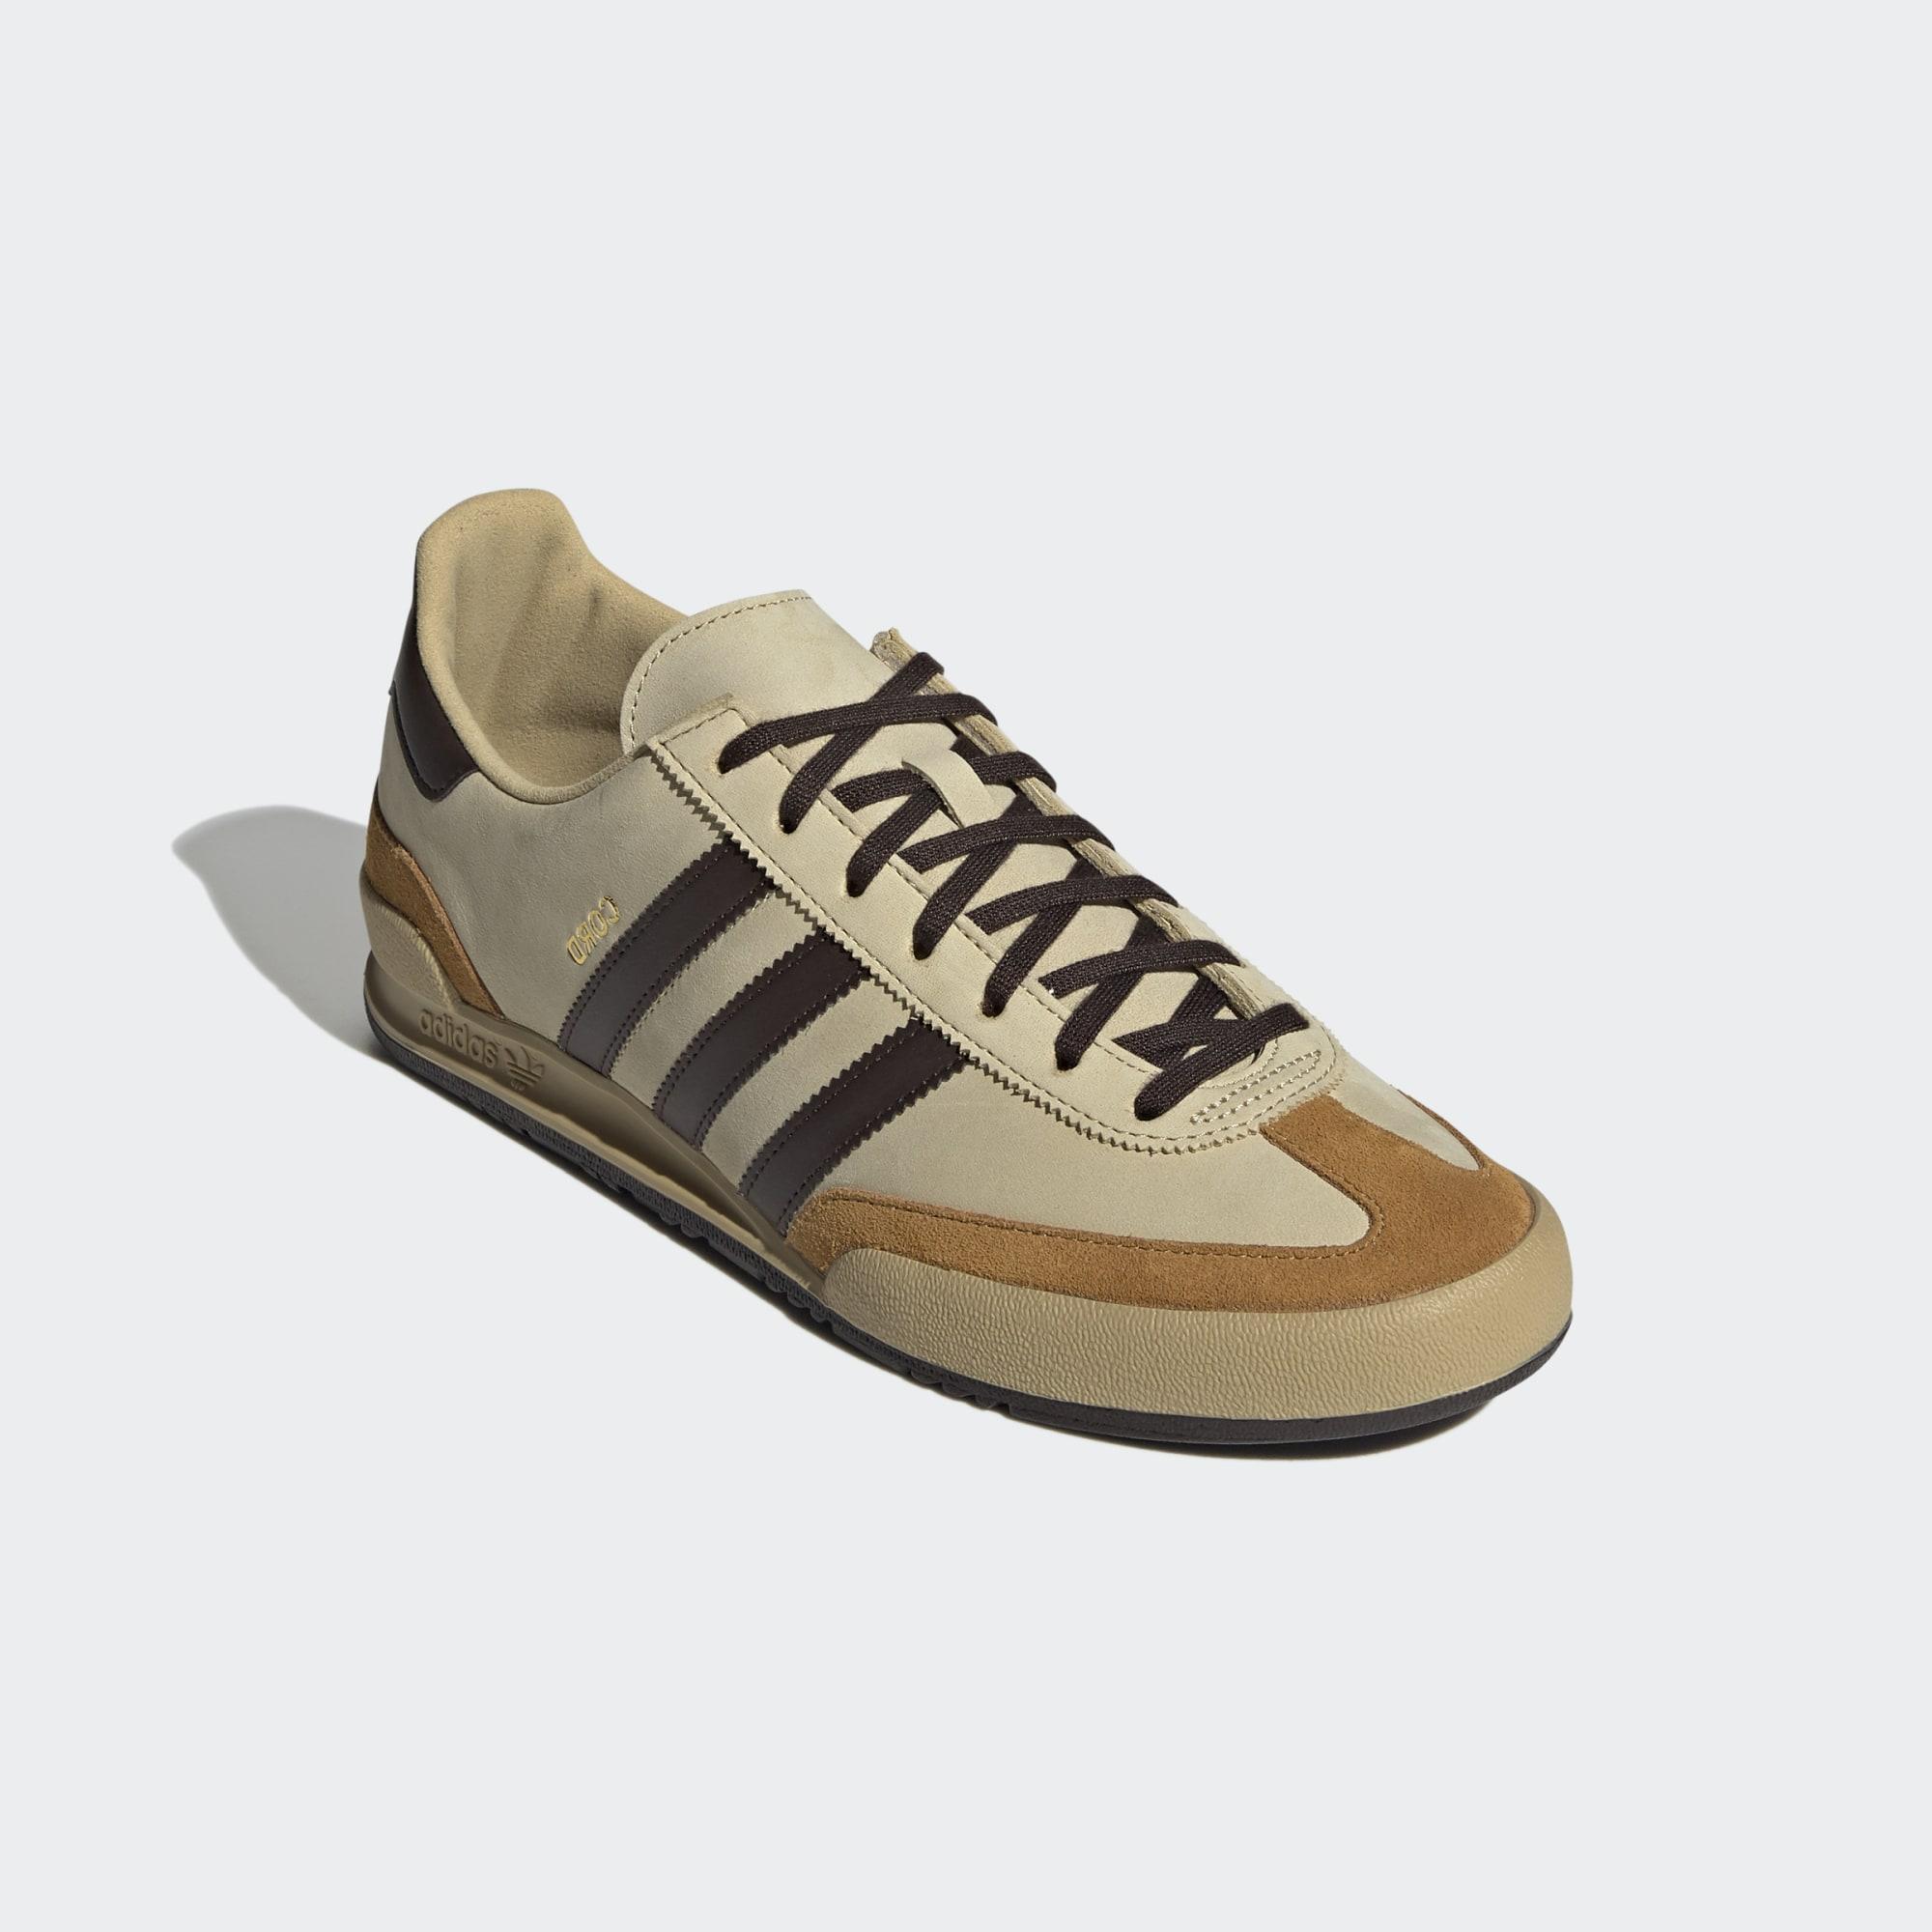 Cord_Shoes_Gul_FX5640_04_standard.jpg